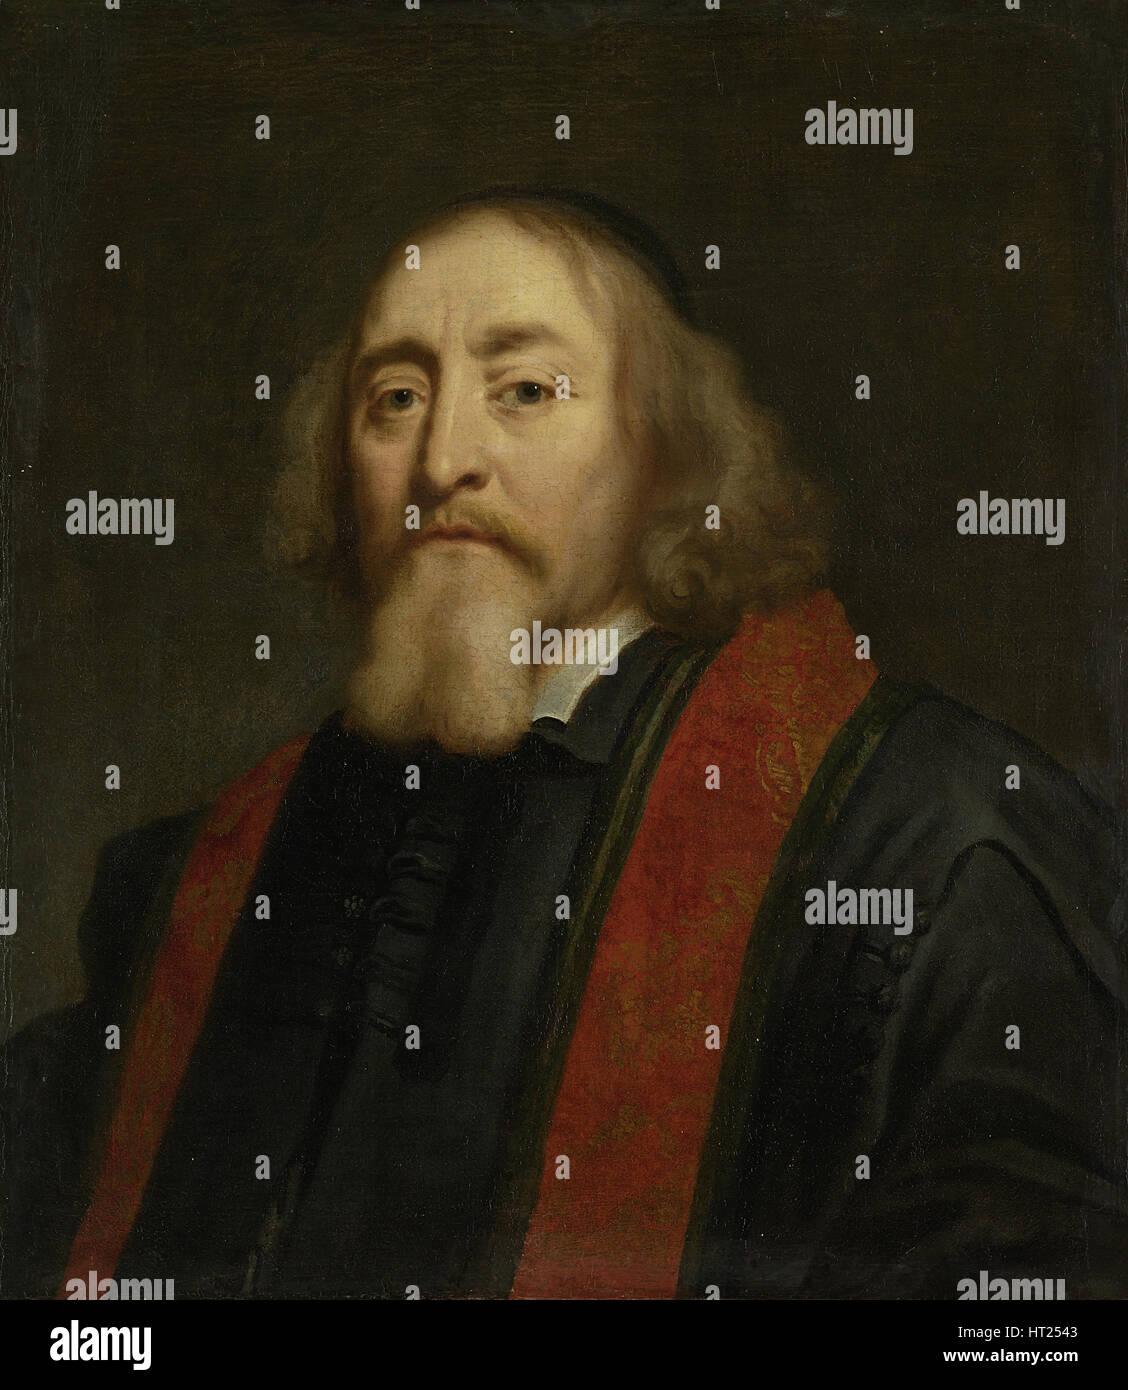 Portrait of Jan Amos Comenius (1592-1670), Betveen 1650 and 1670. Artist: Ovens, Jürgen (1623-1678) - Stock Image